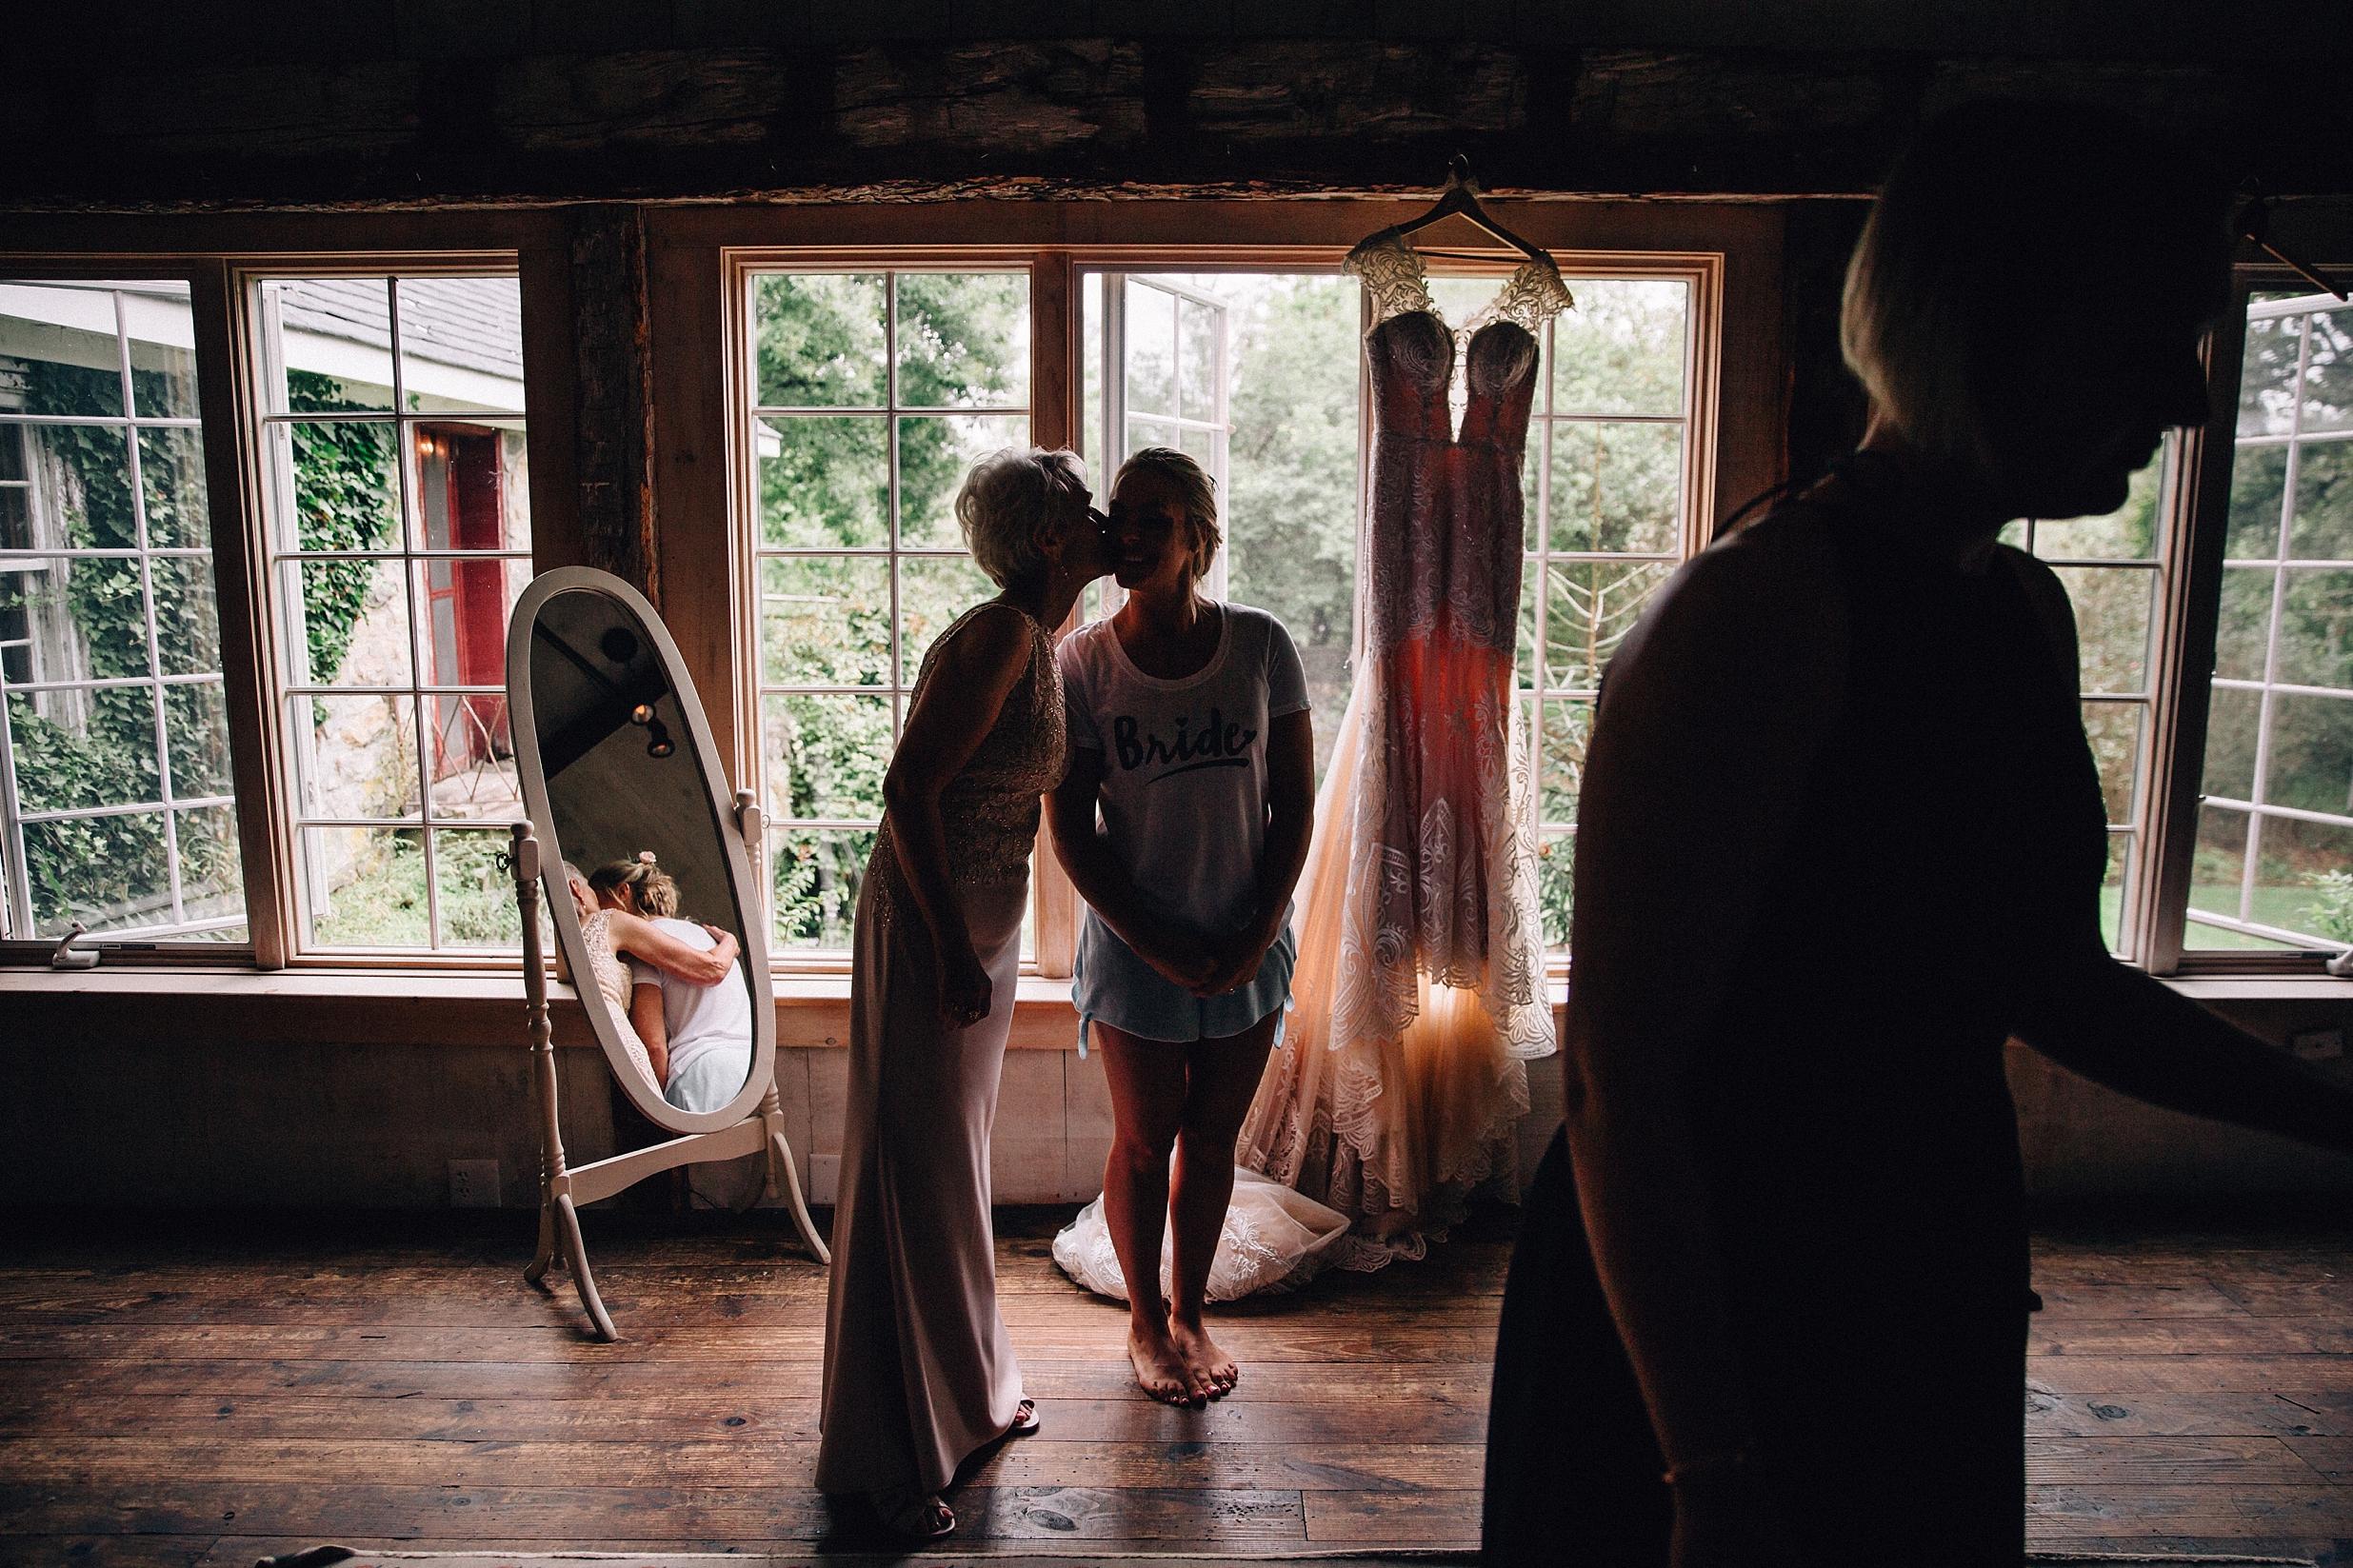 crossed-keys-outdoor-ceremony-camp-wedding-photo_0076.jpg